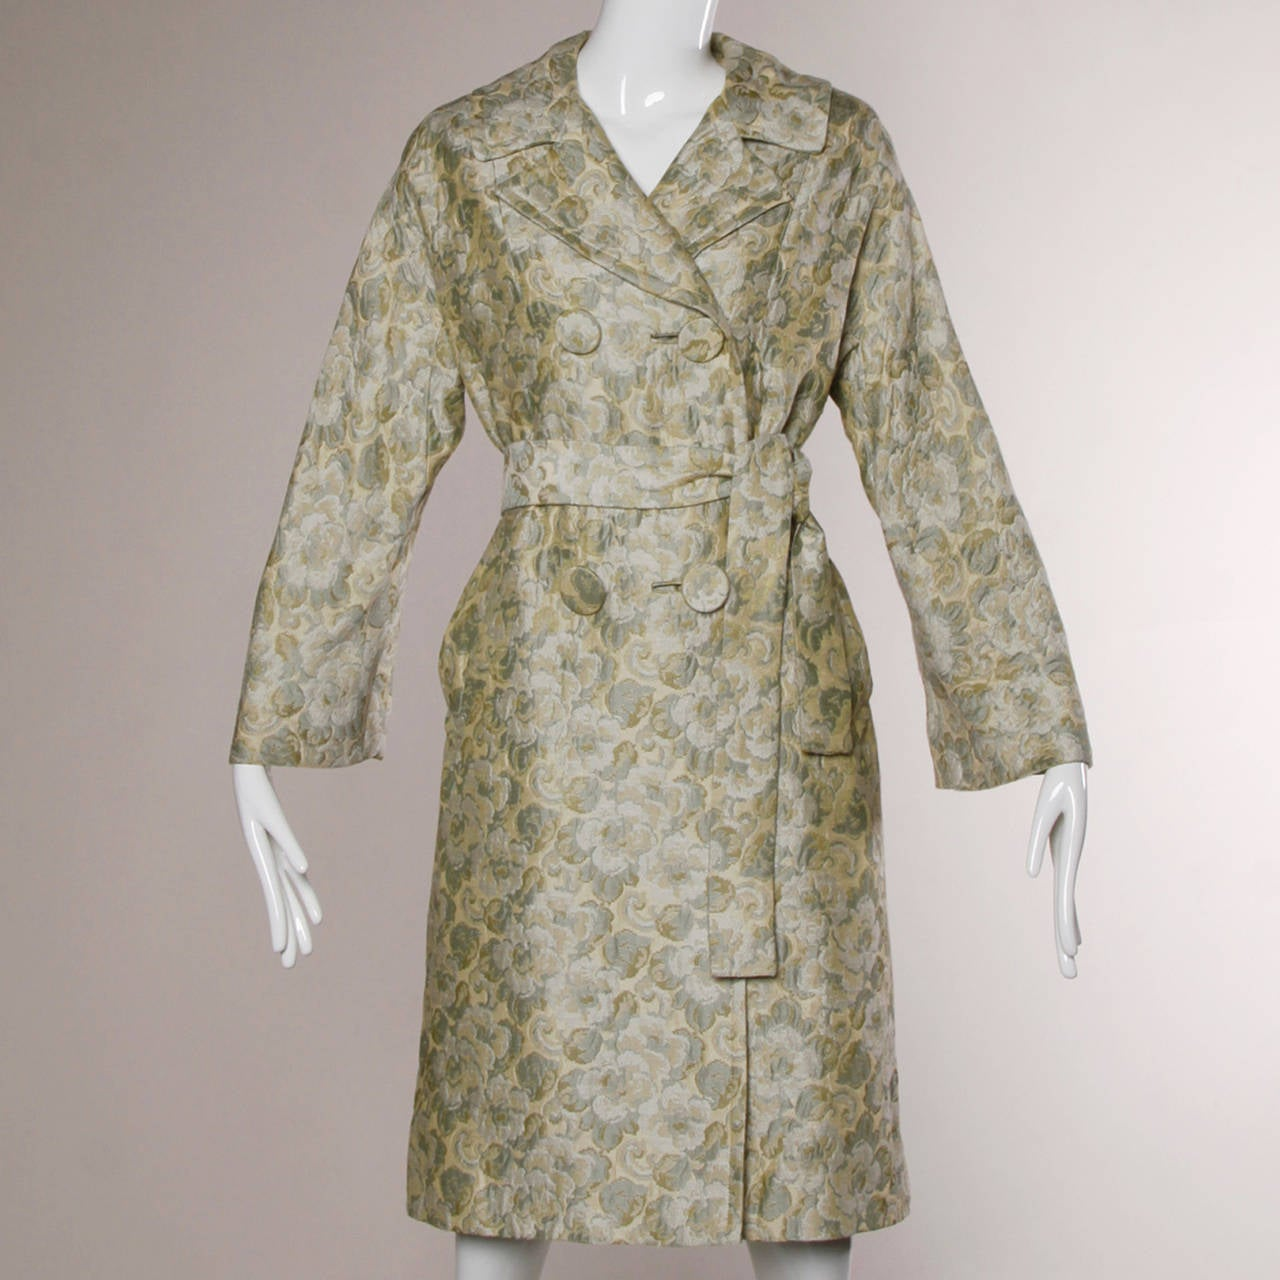 Joseph Magnin 1960s Vintage Metallic Brocade Tapestry Trench Coat 2